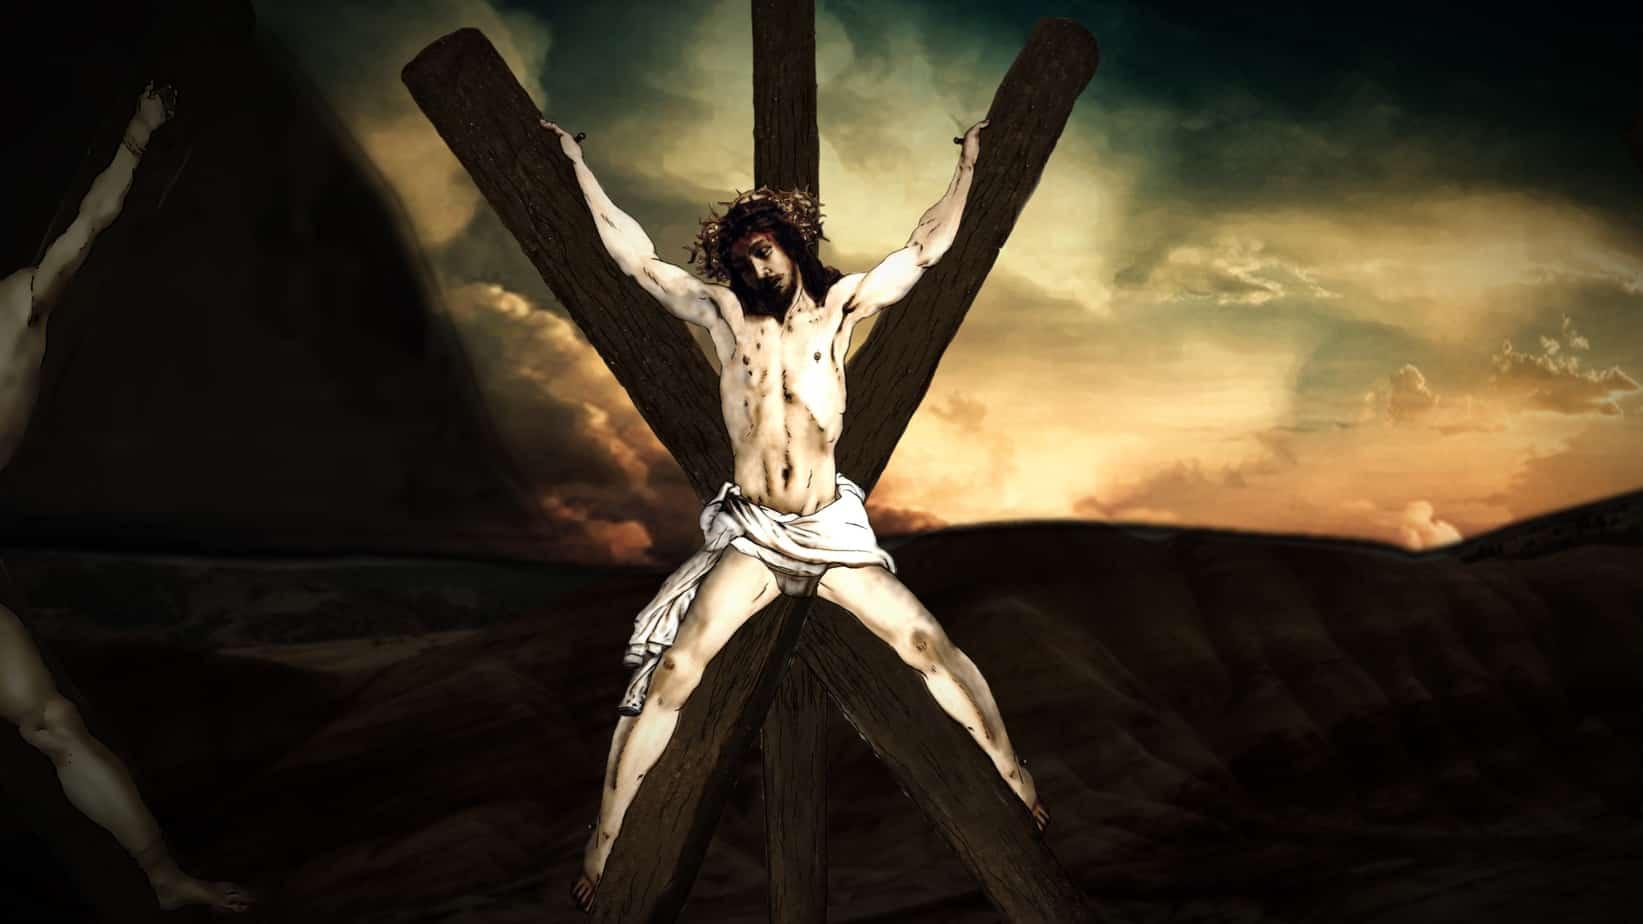 Carpenter Really Jesus Was